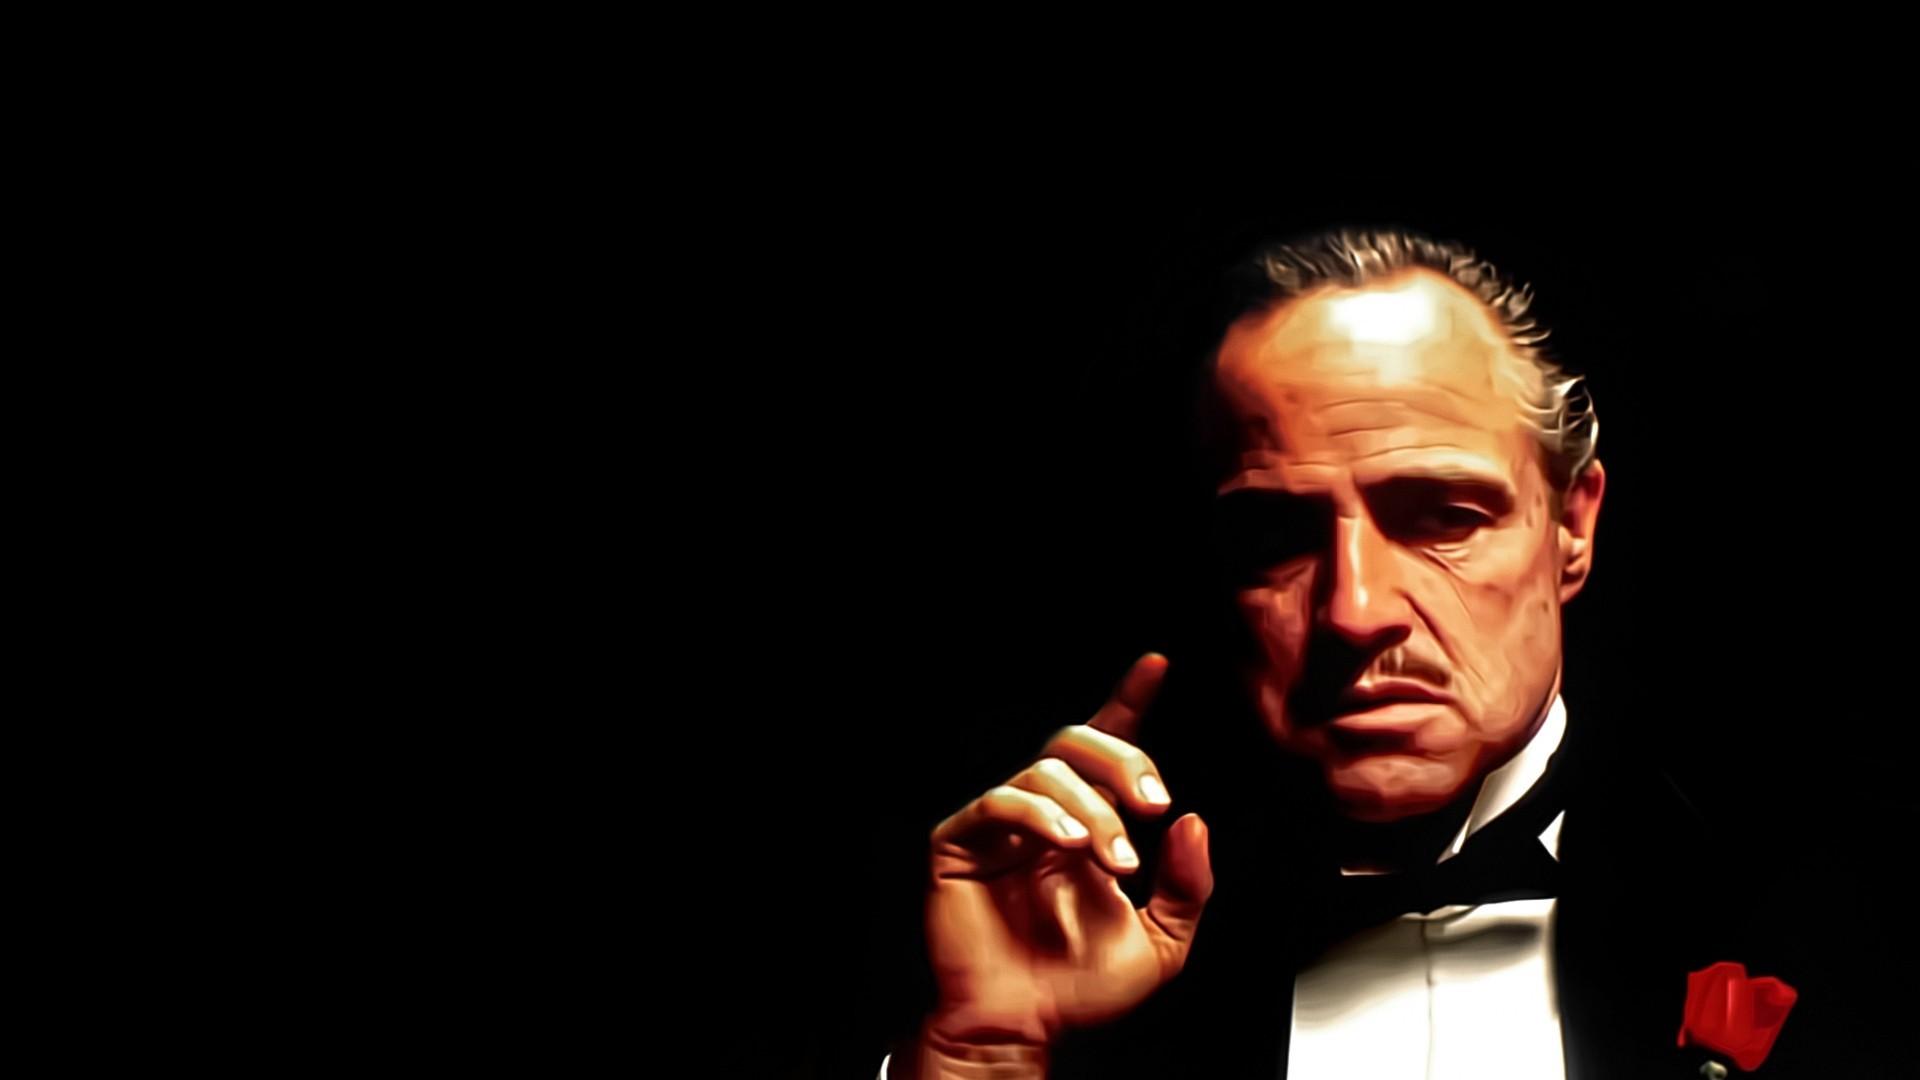 Res: 1920x1080, The Godfather · Marlon Brando